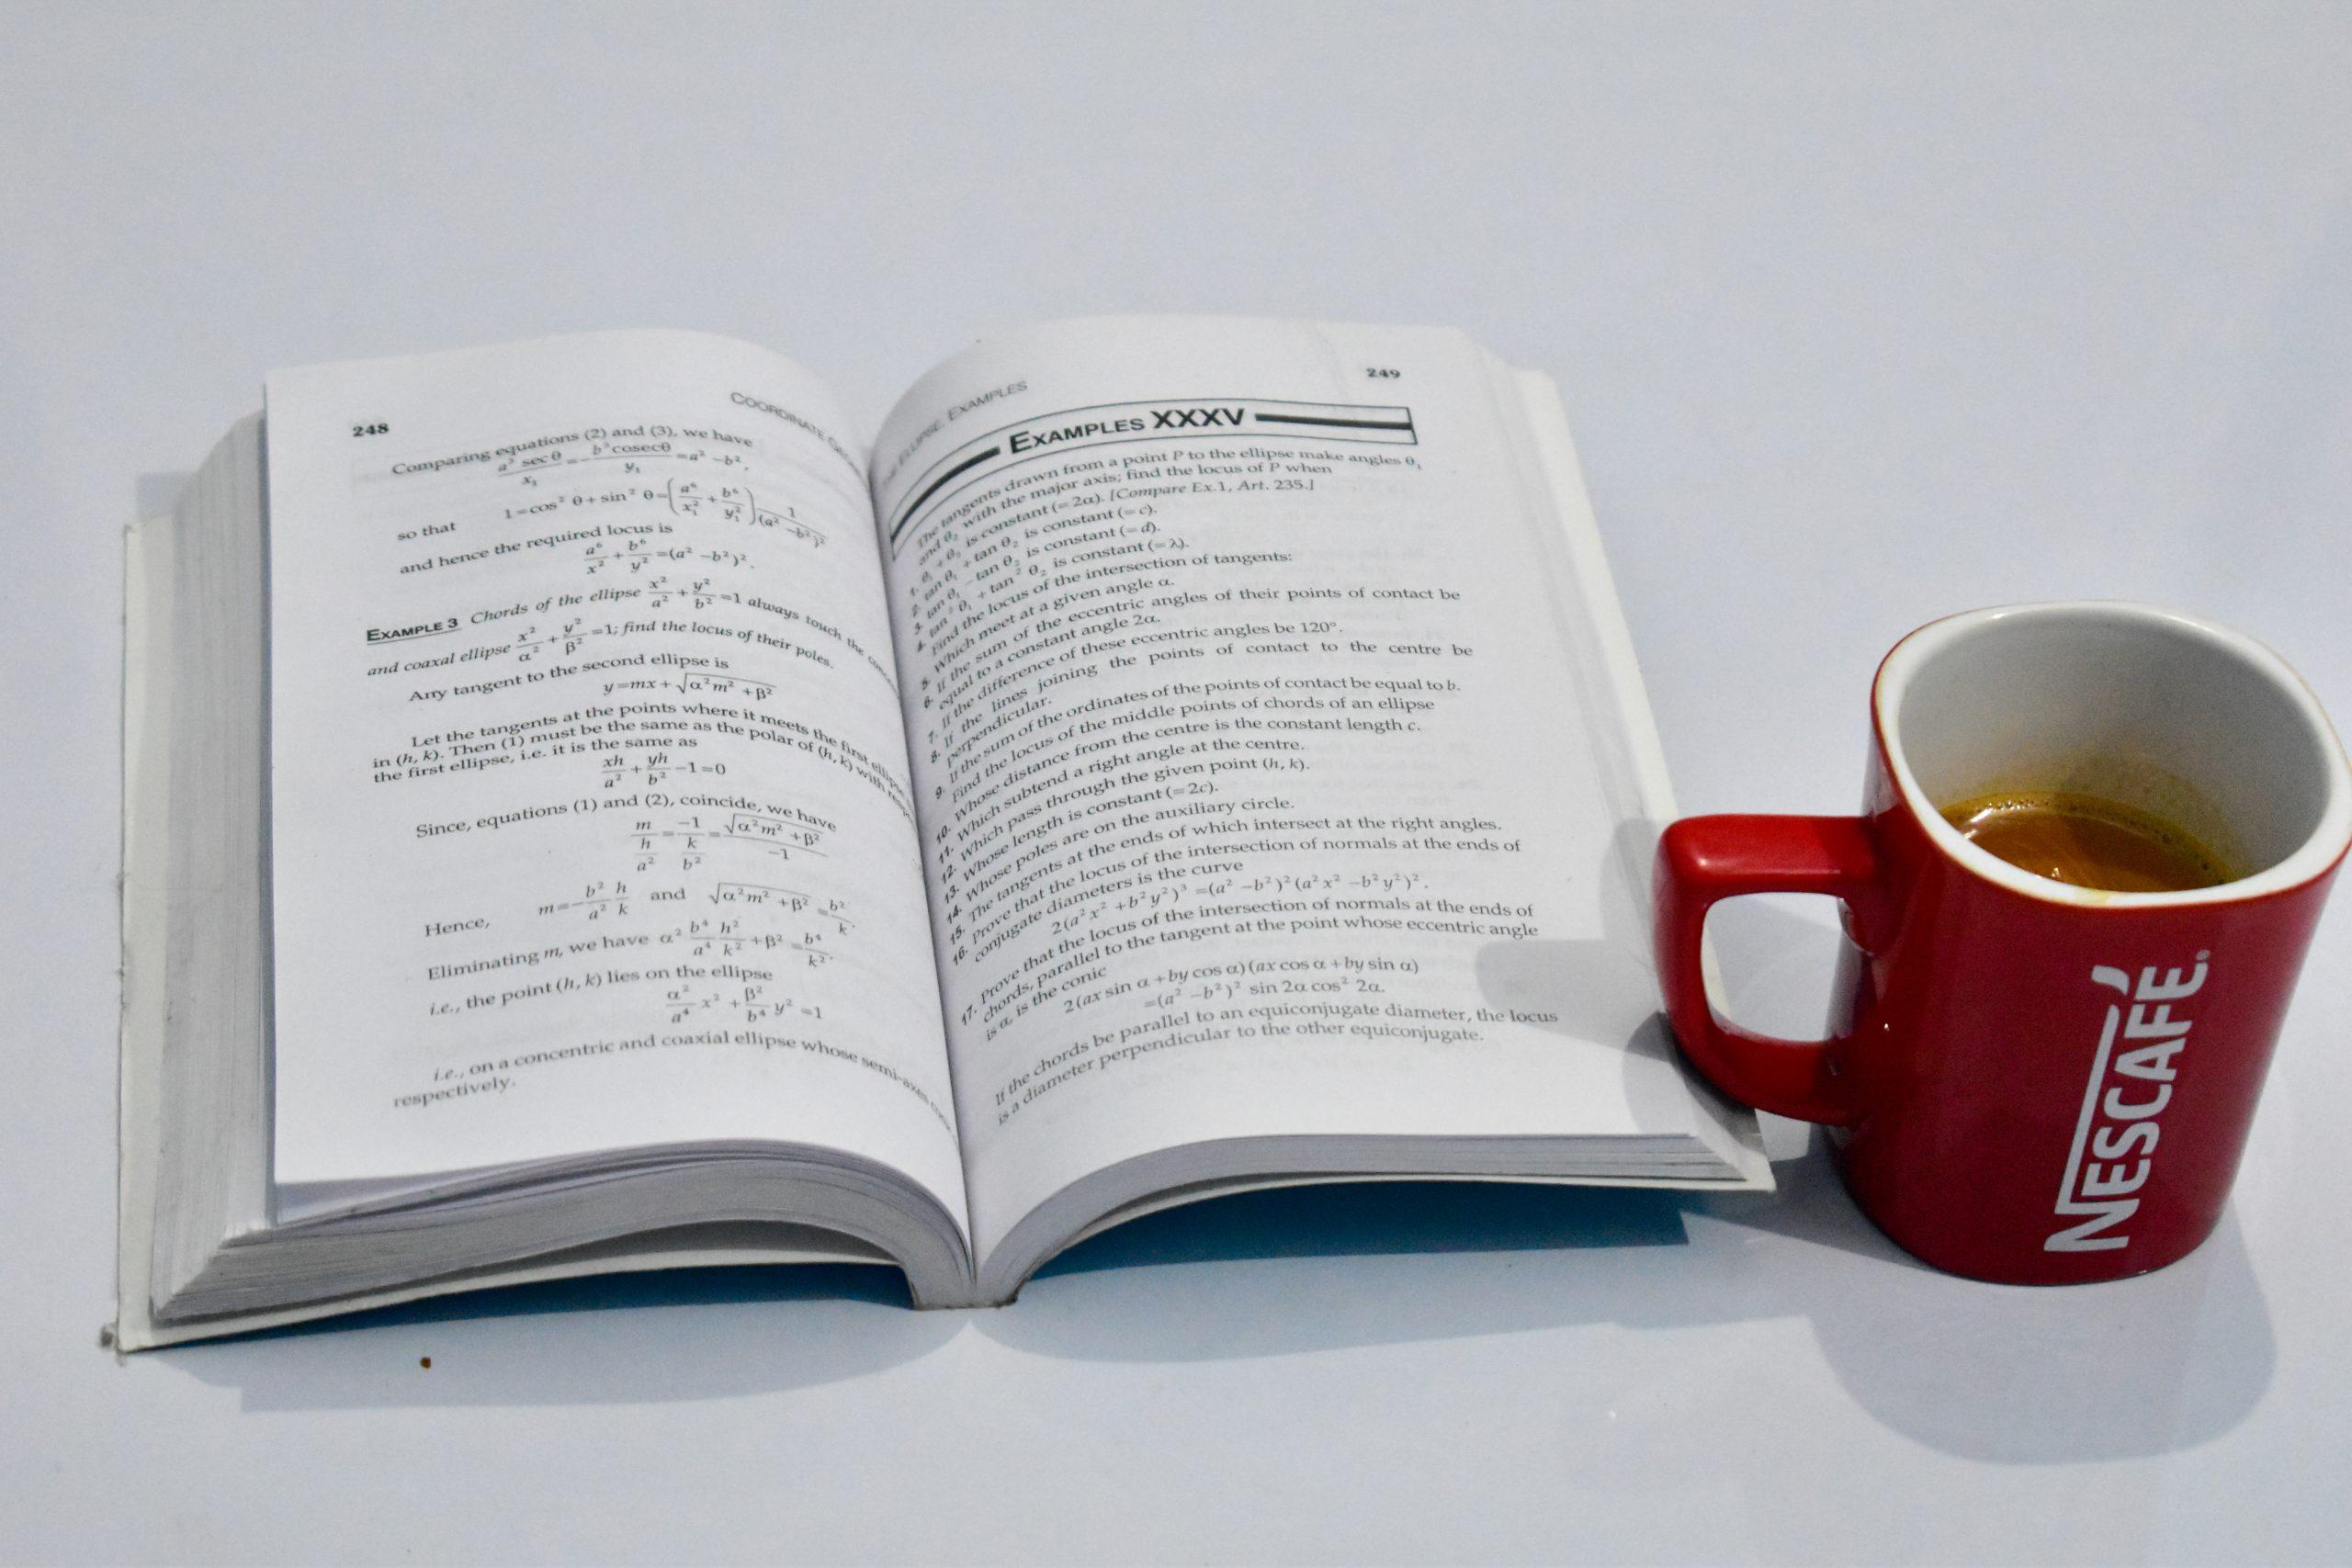 An open book and coffee mug